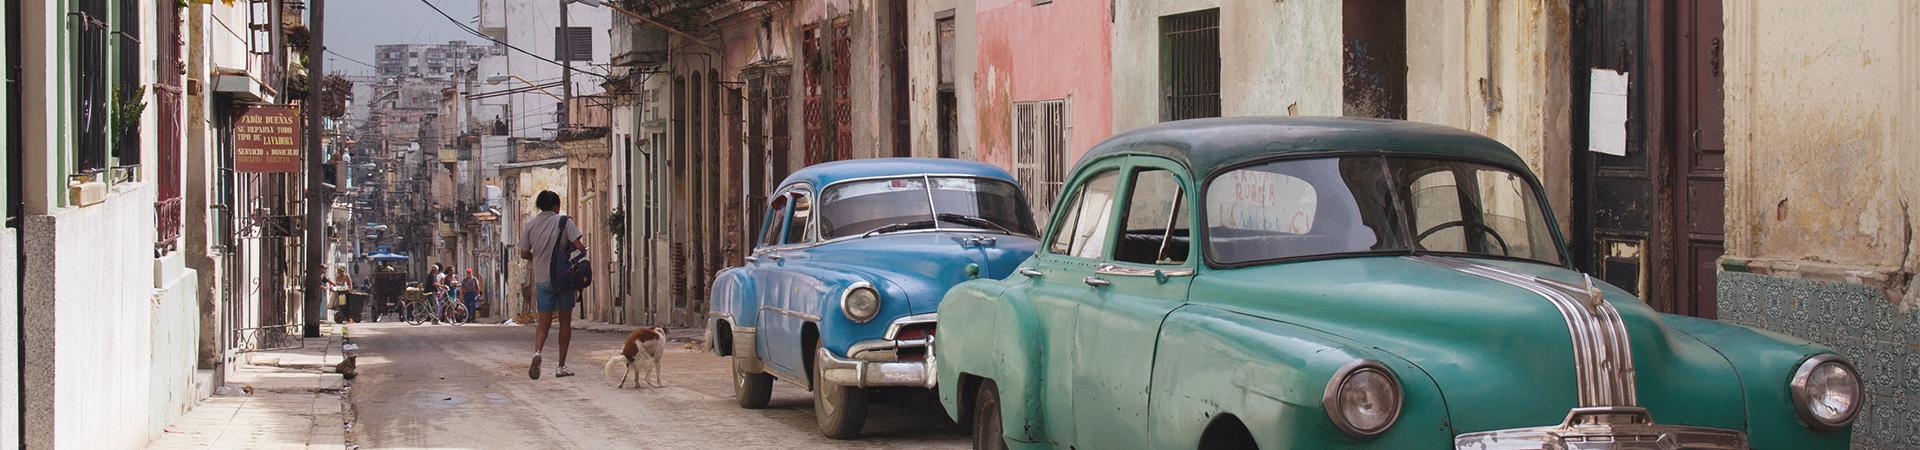 34_Havana